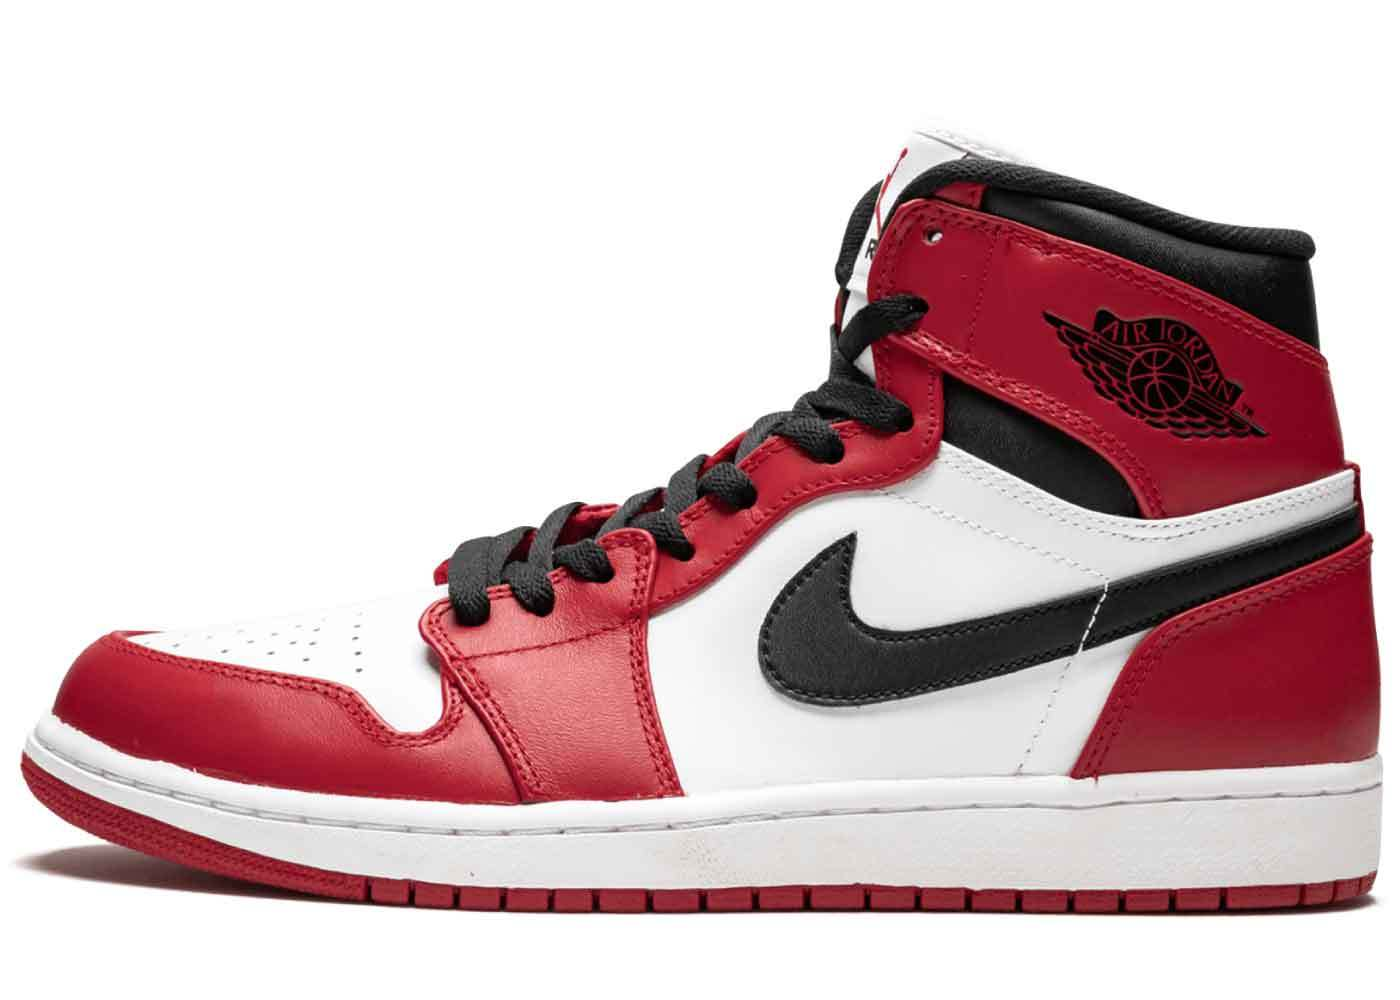 Nike Air Jordan 1 Retro Chicago (2013)の写真